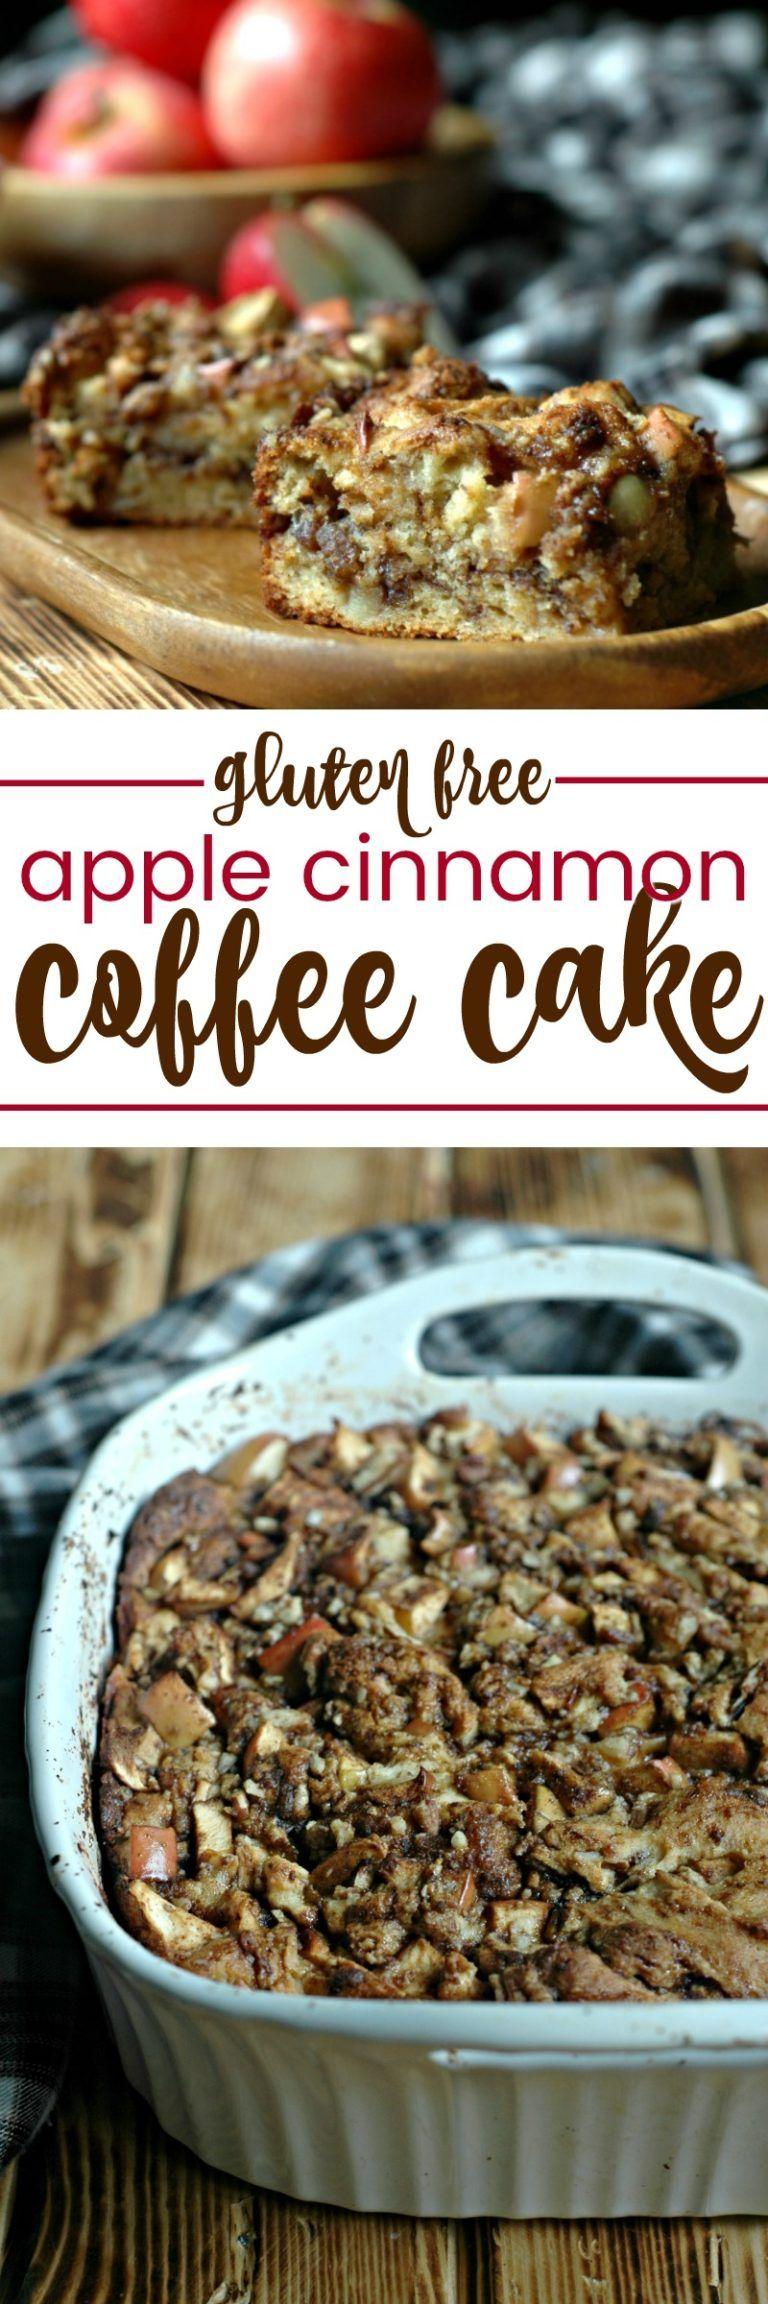 Gluten free apple cinnamon coffee cake raising